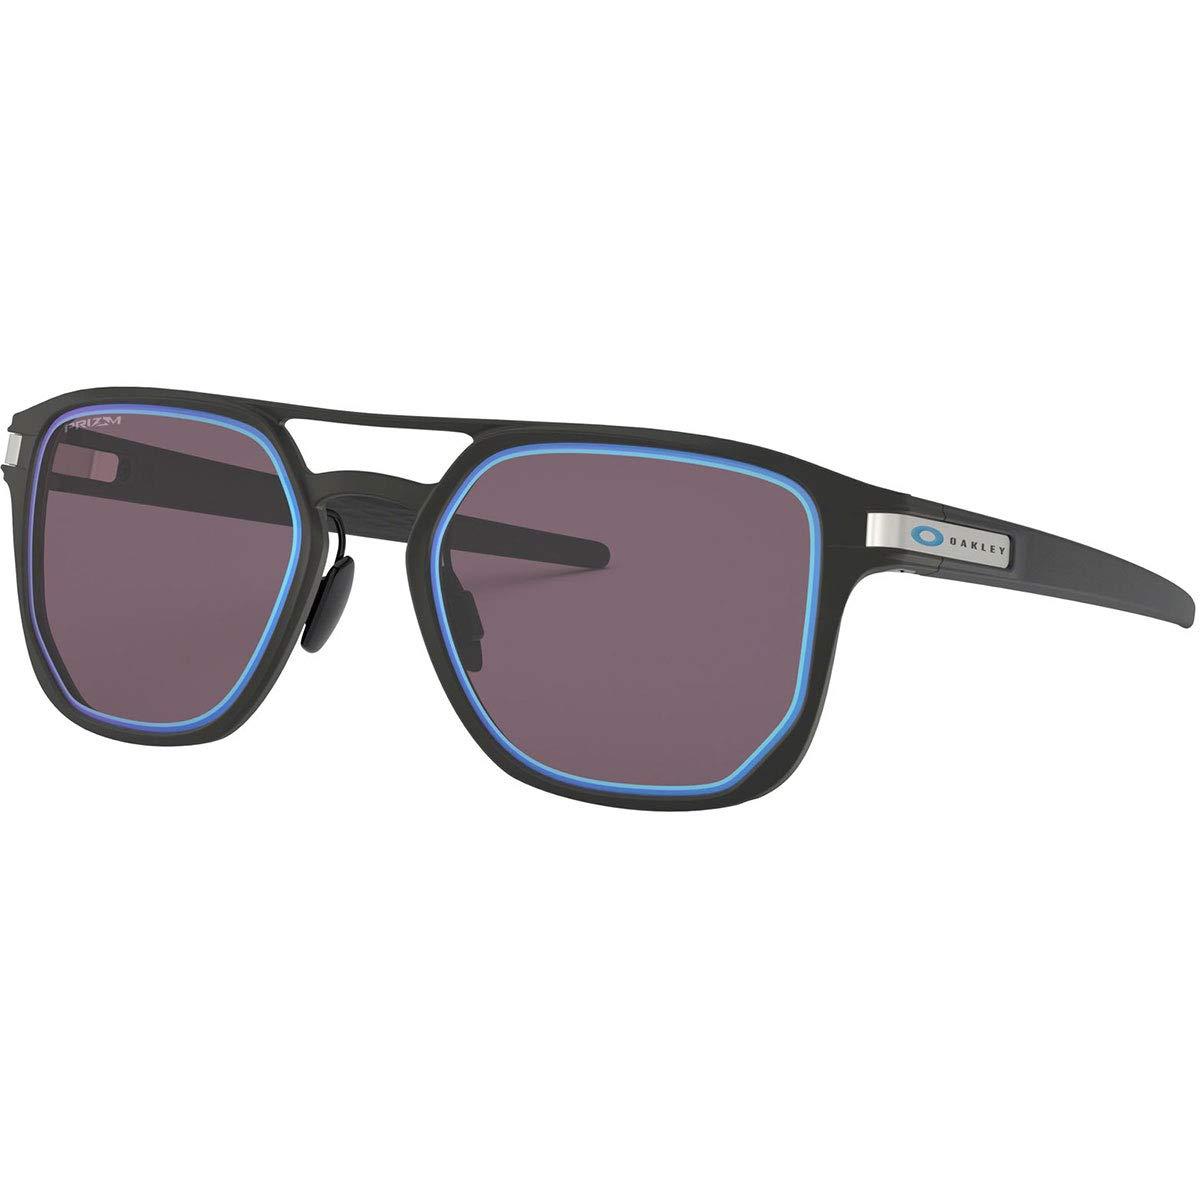 8c133fae7f Amazon.com  Oakley Latch Sunglasses  Clothing